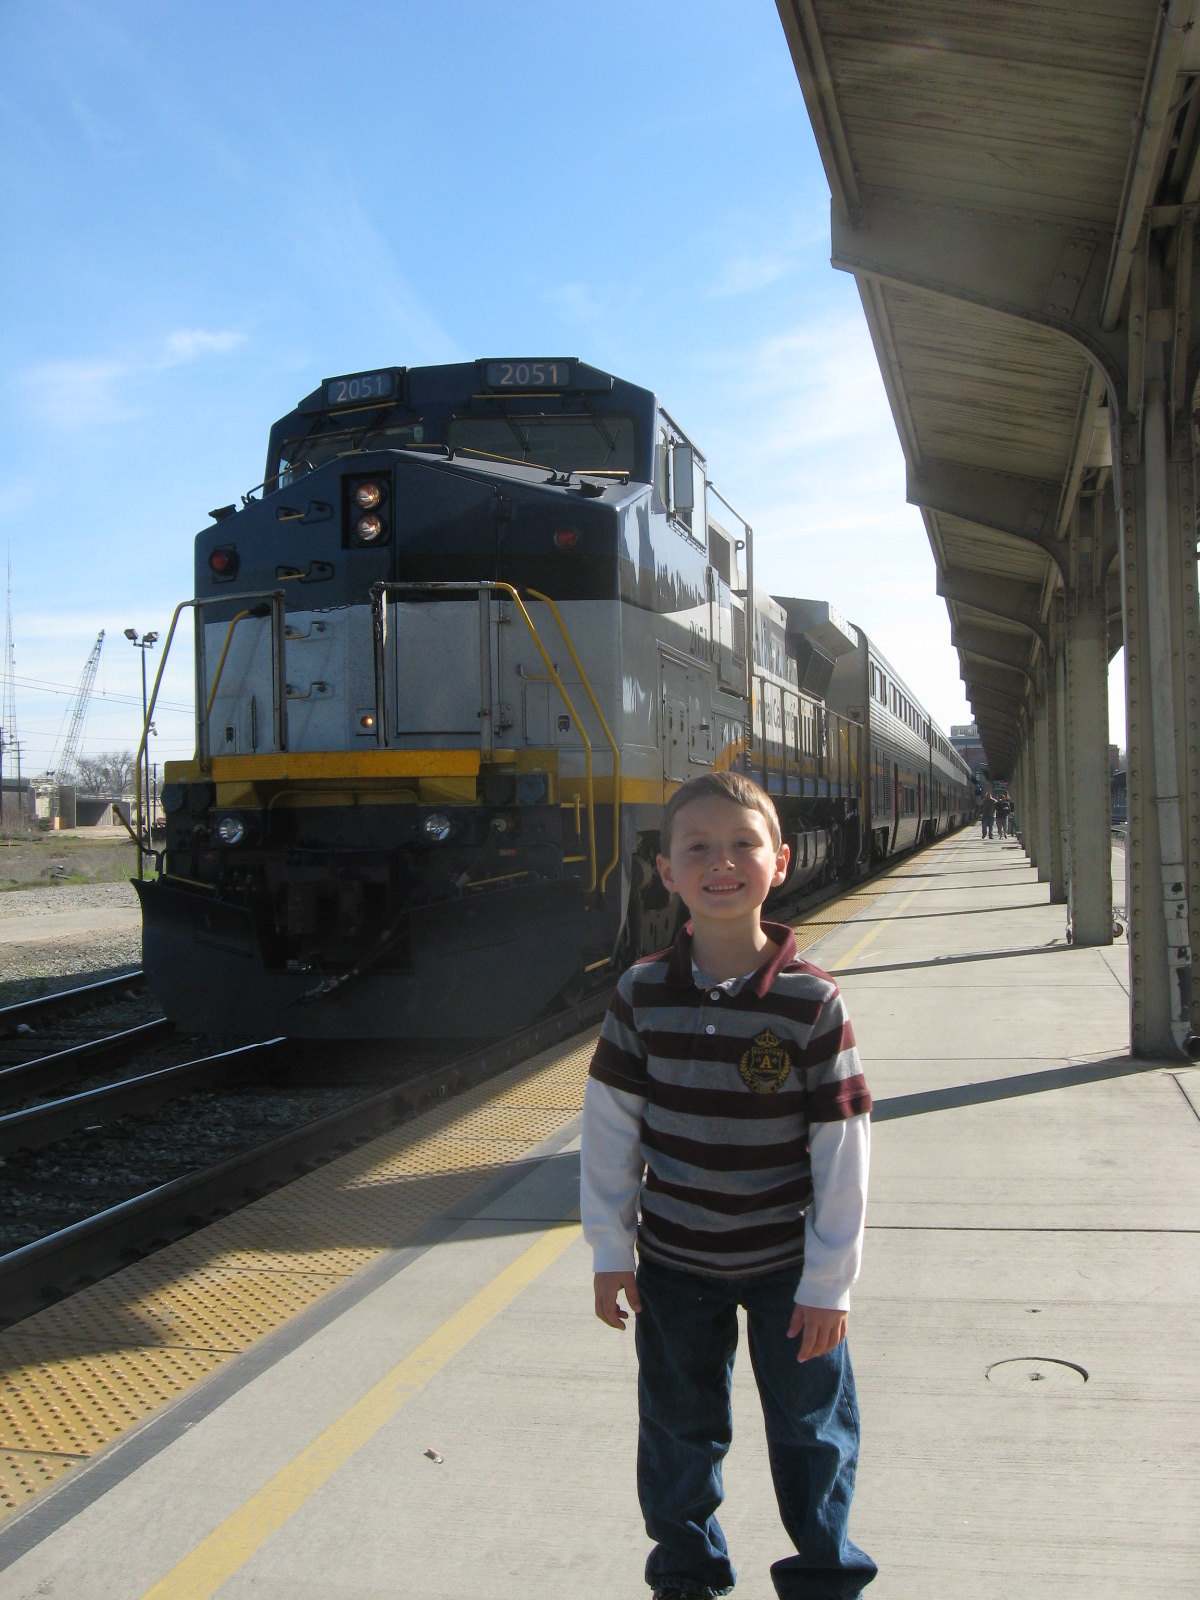 Rail – Jordan's first train ride